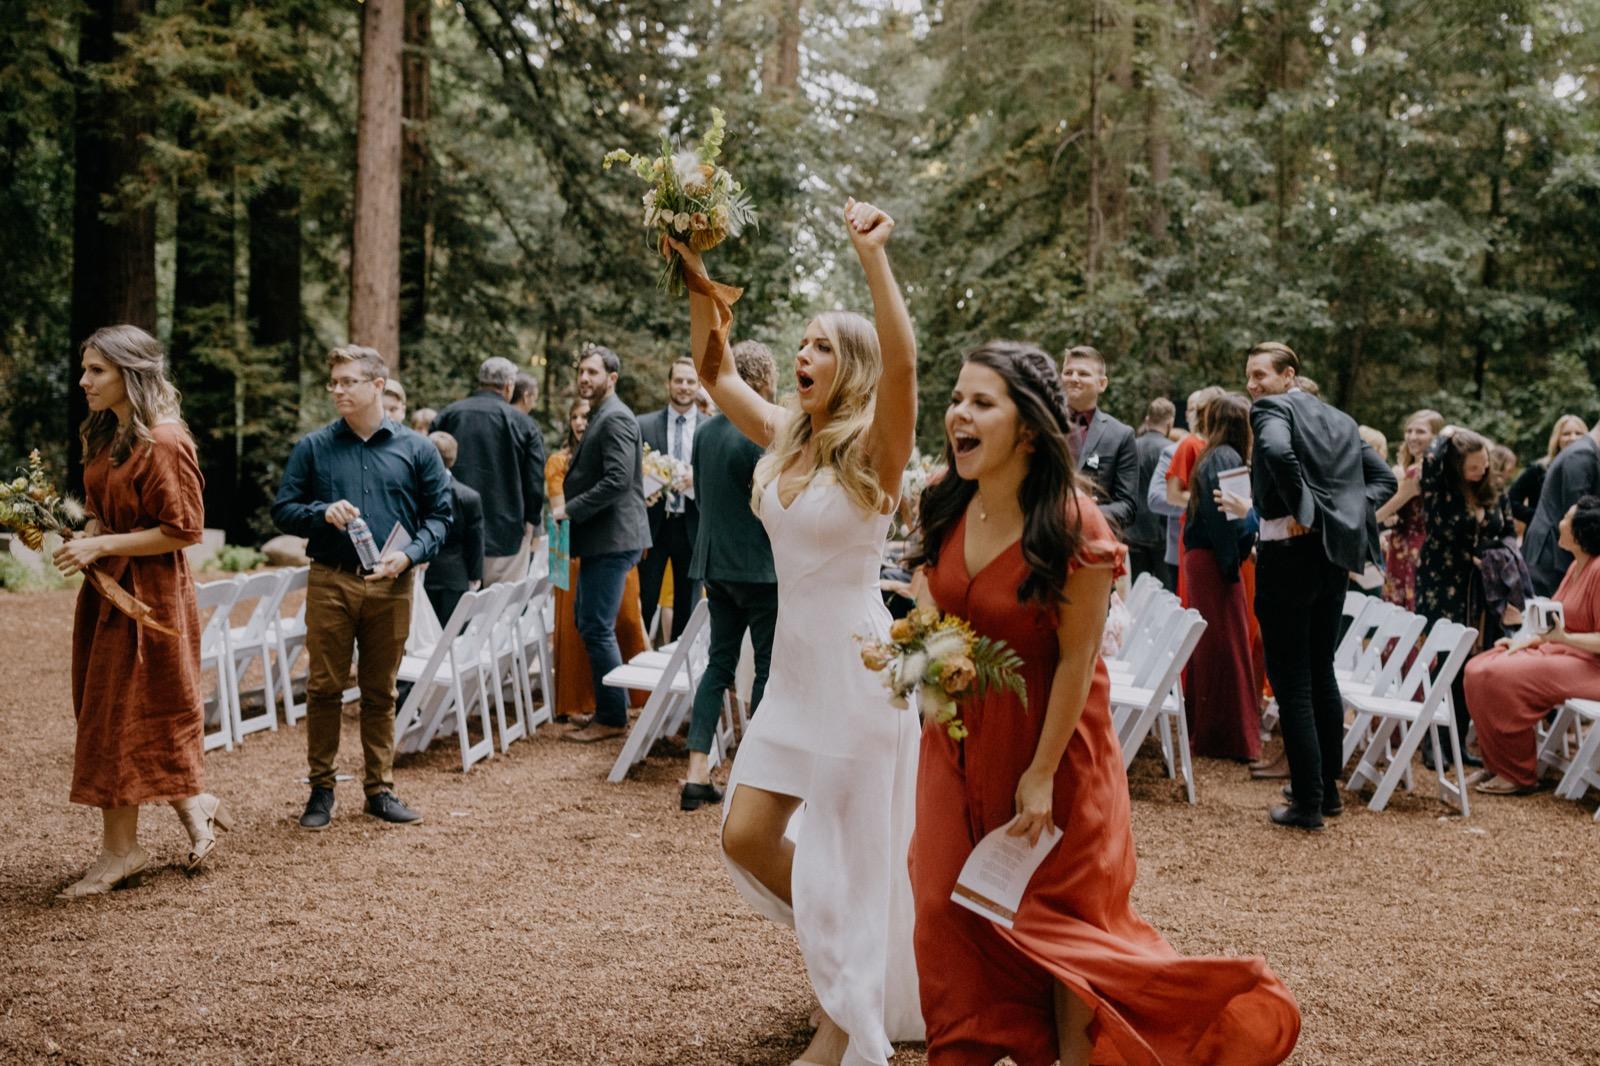 083_Emily & Jeff Wedding 0756_the-waterfall-lodge_forest_wedding_ben-lomond_intimate